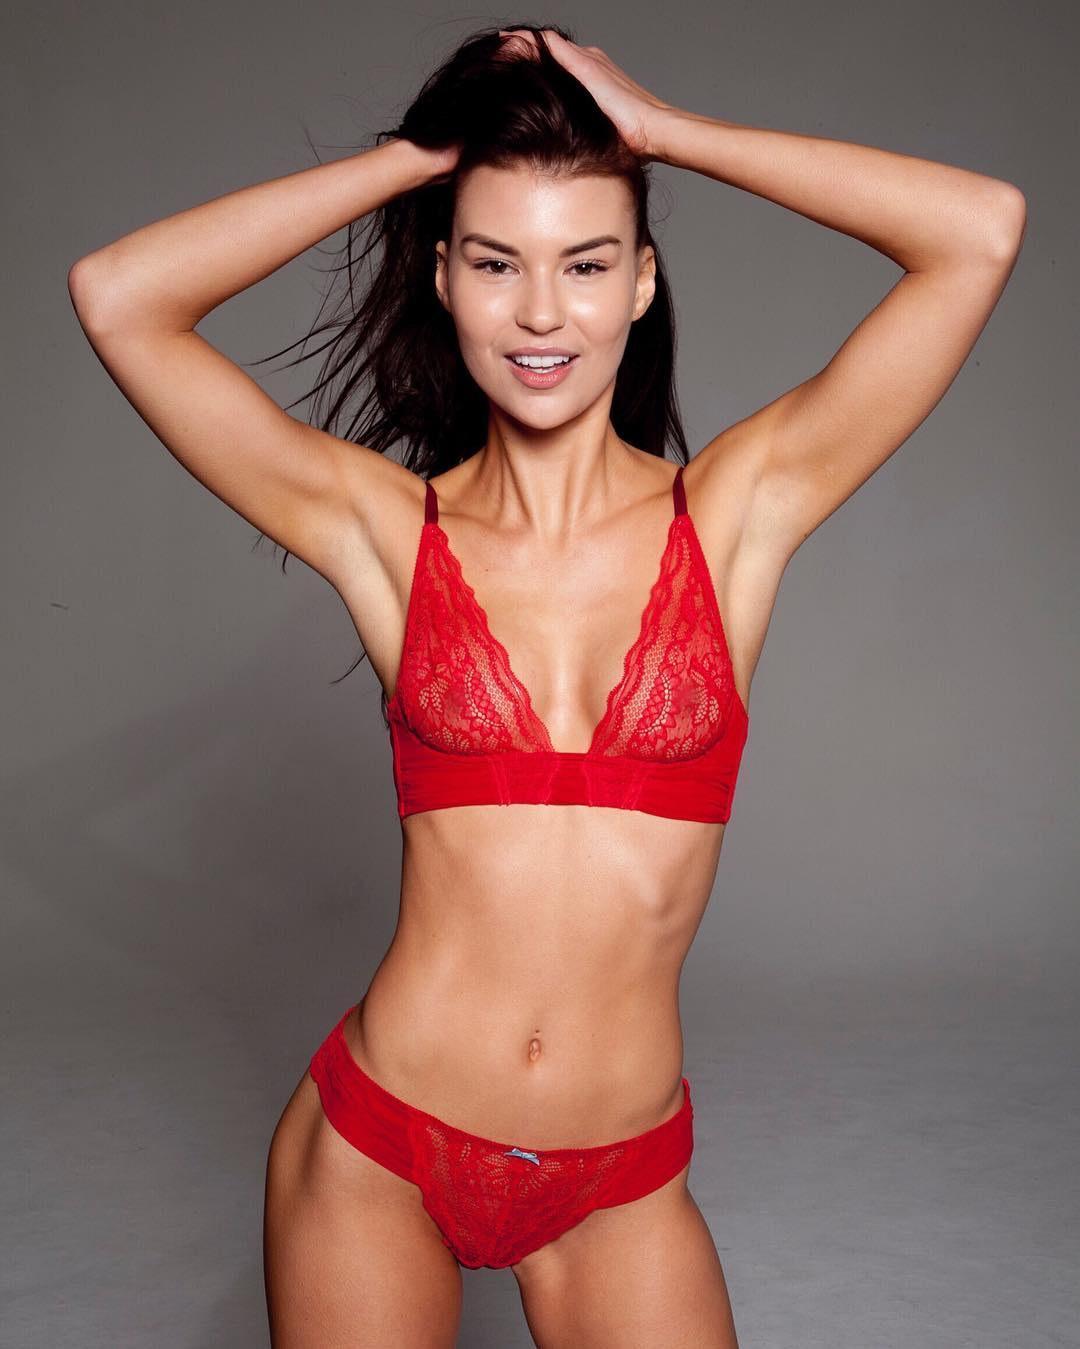 Model Stacy